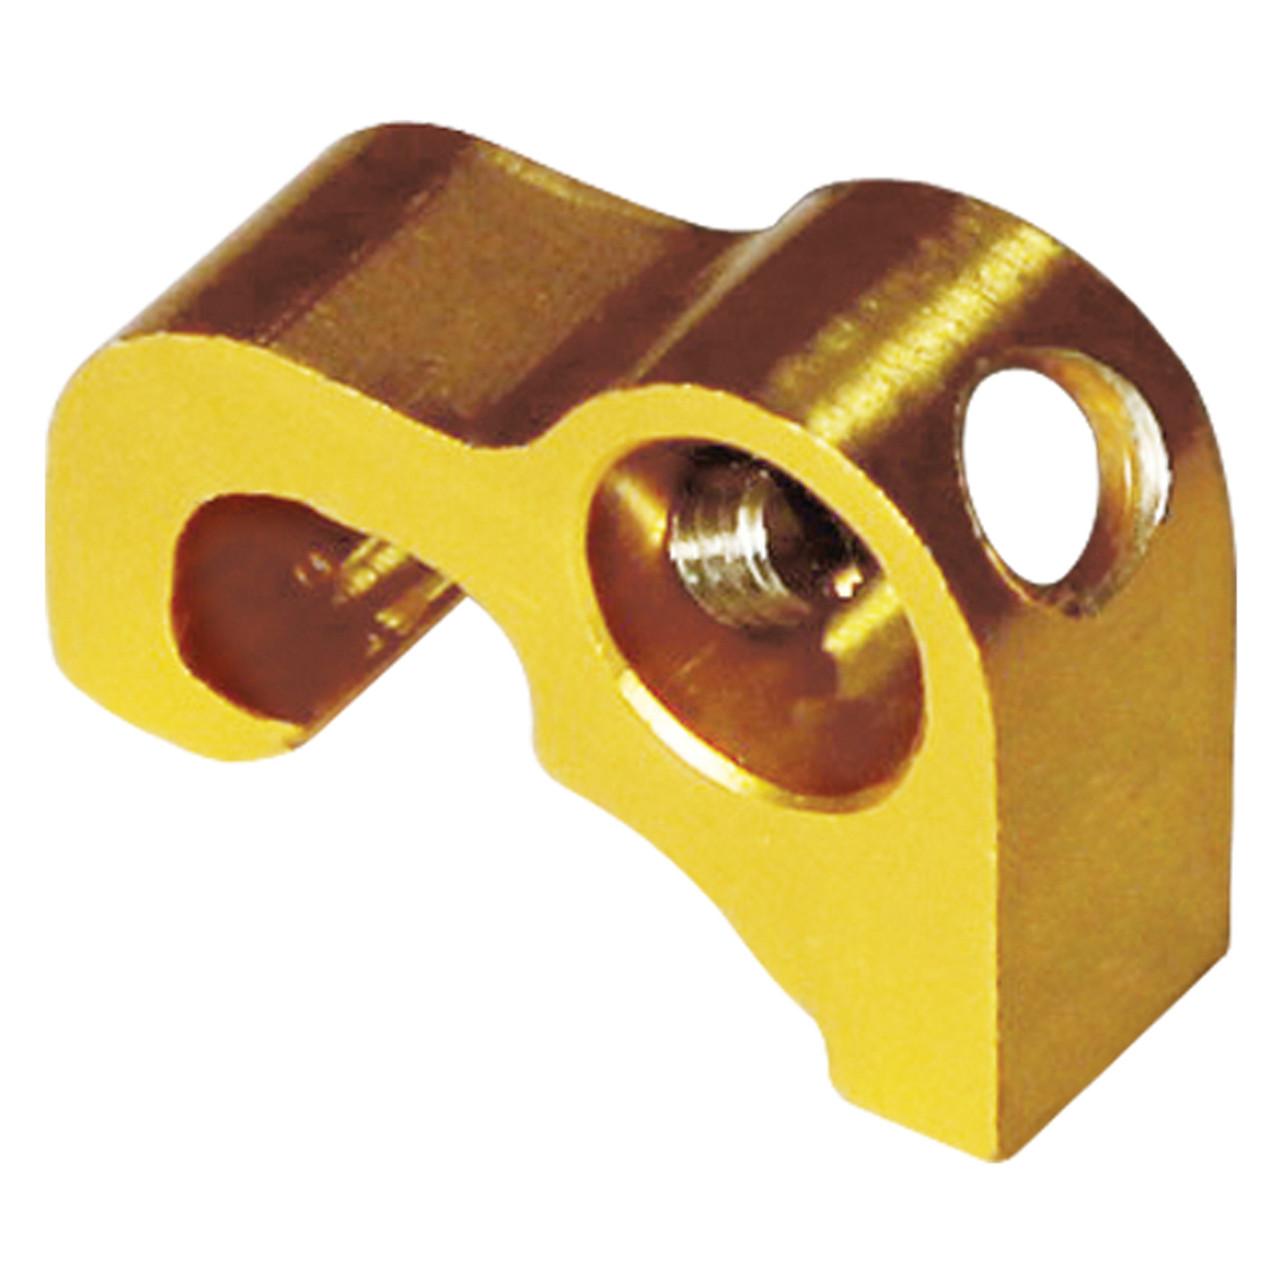 Small Micro Breaker Lockout